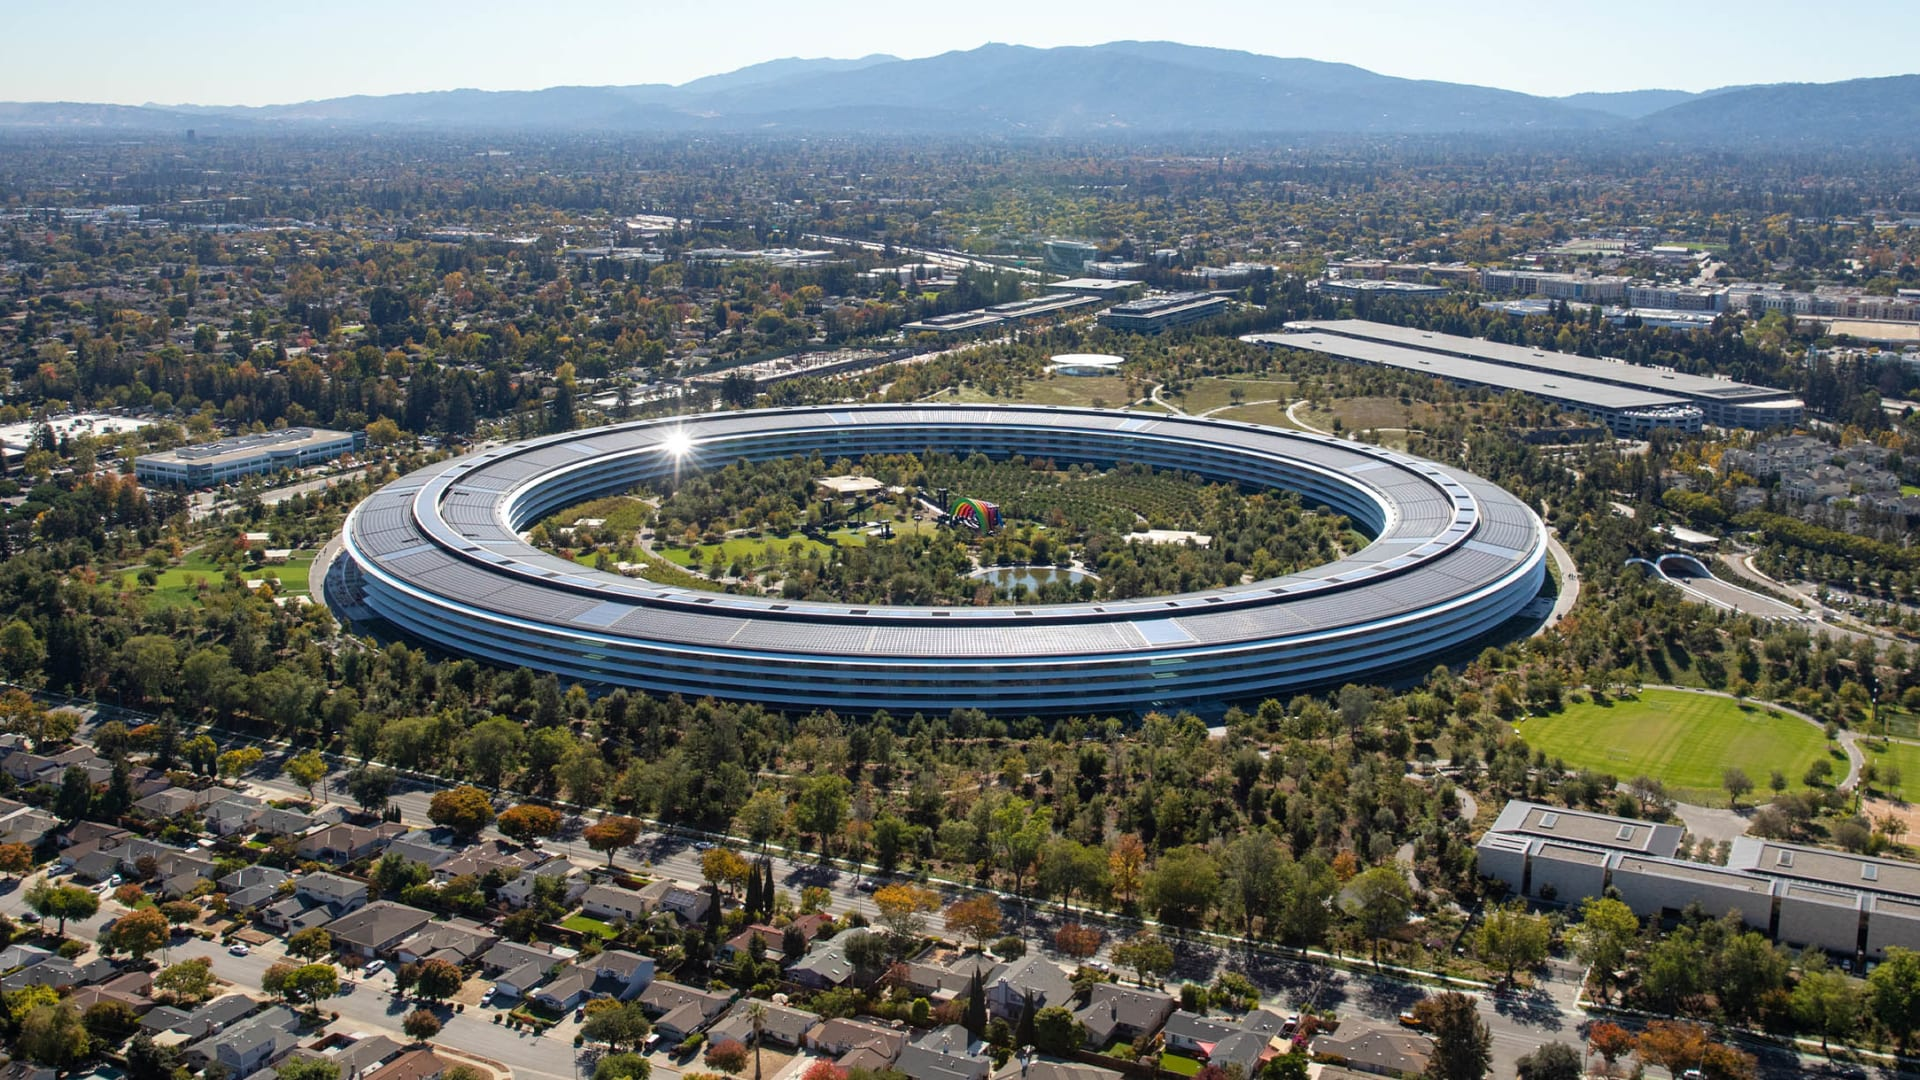 The Apple Park campus in Cupertino, California.